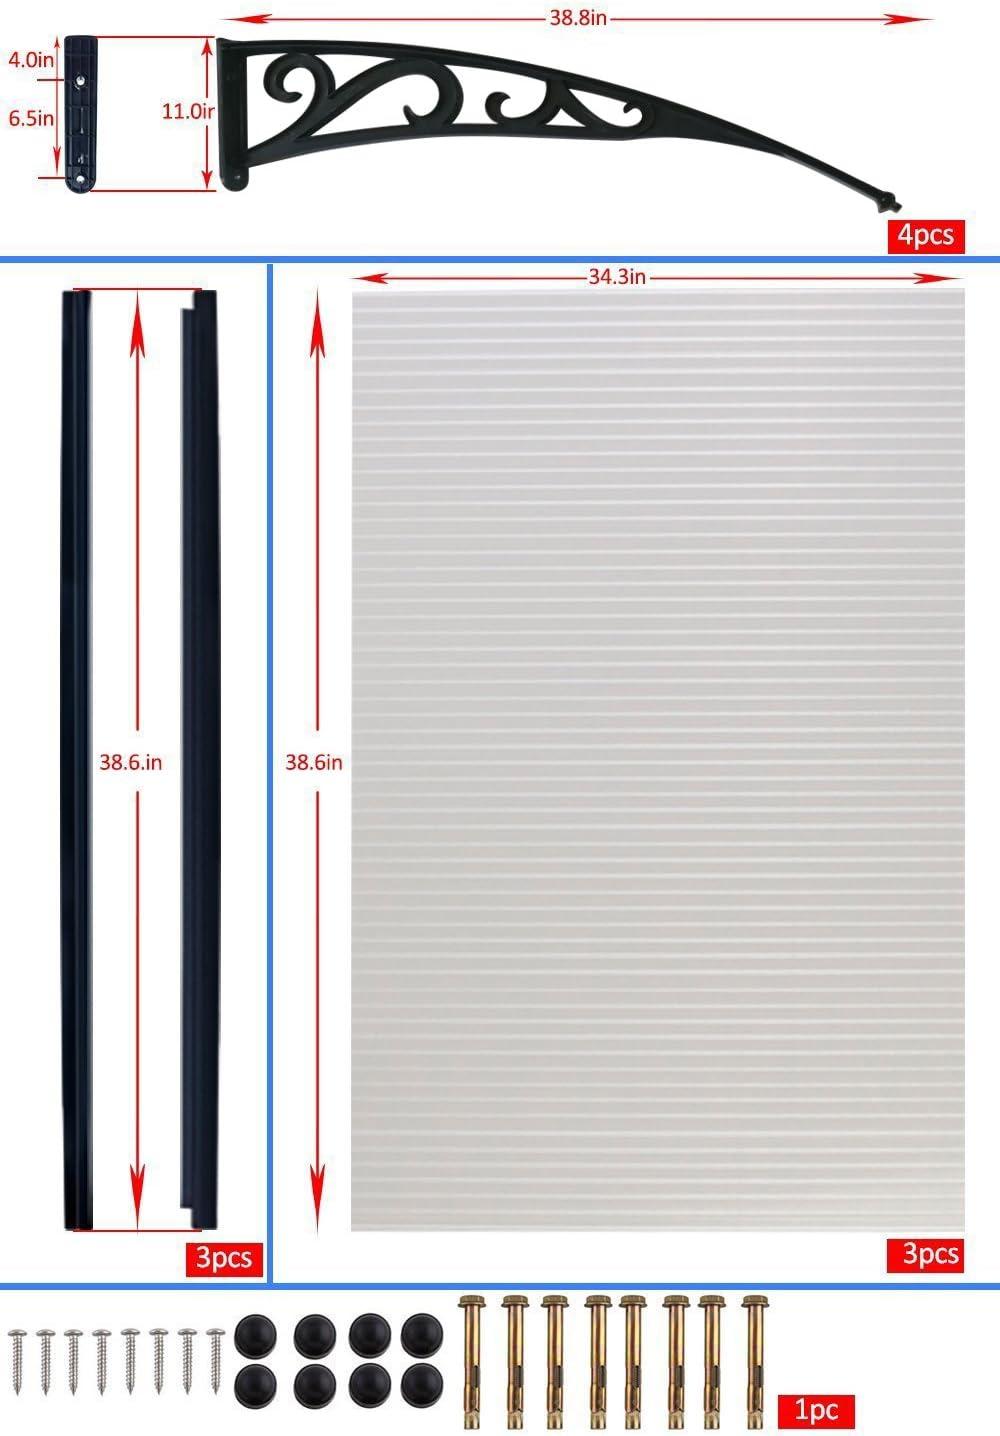 Dripex Vordach Pultbogenvordach /Überdachung Polycarbonat Transparentes 120*75cm Schwarz